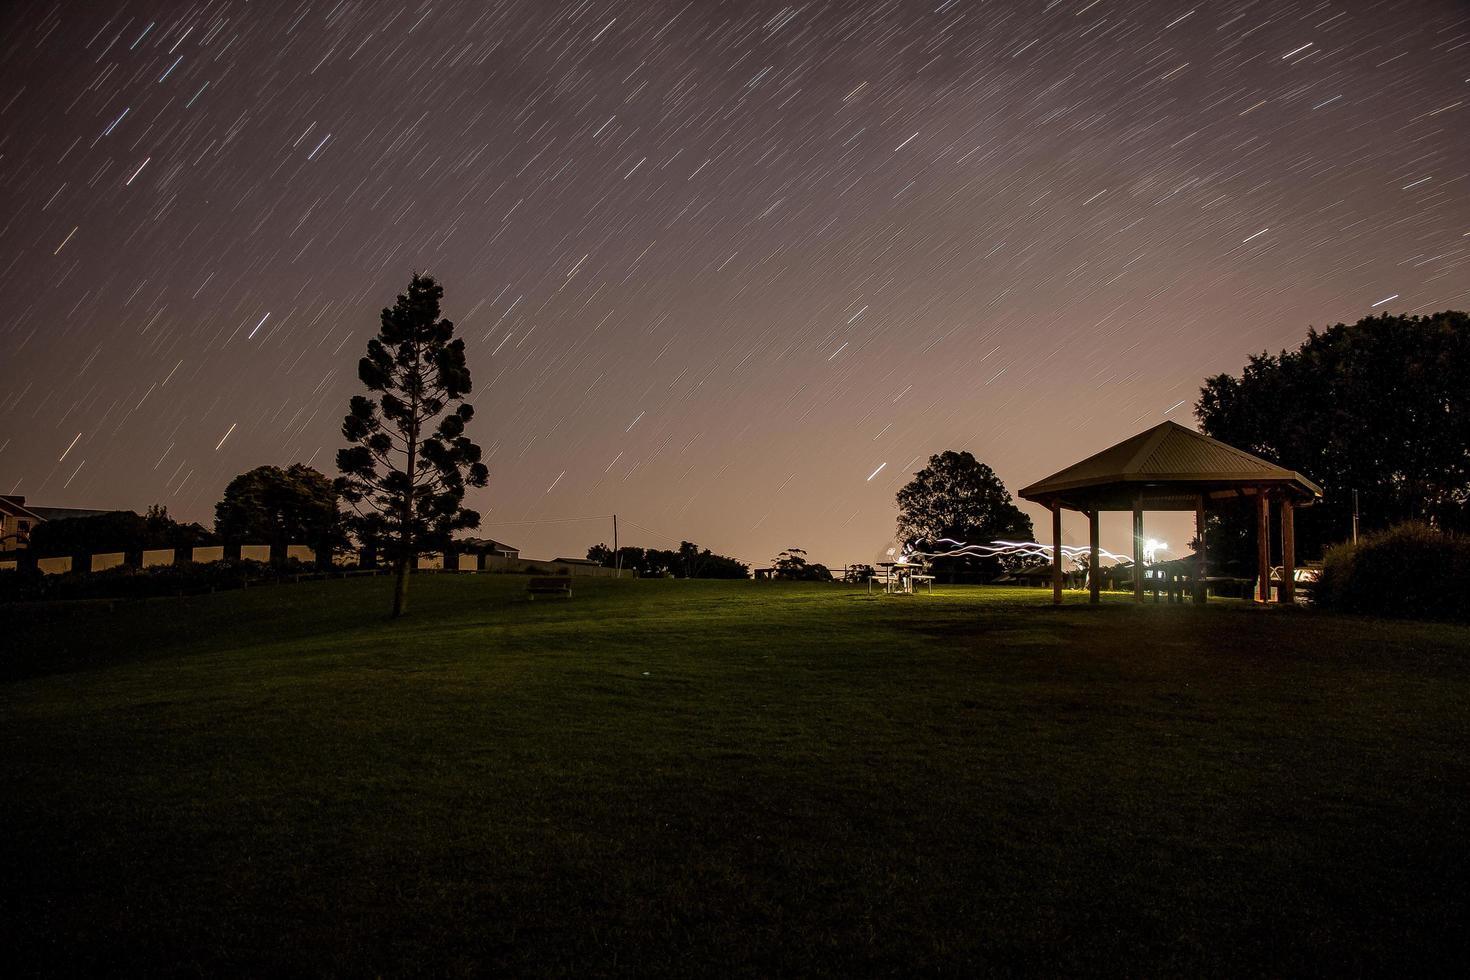 brauner Pavillon unter sternenklarer Nacht foto